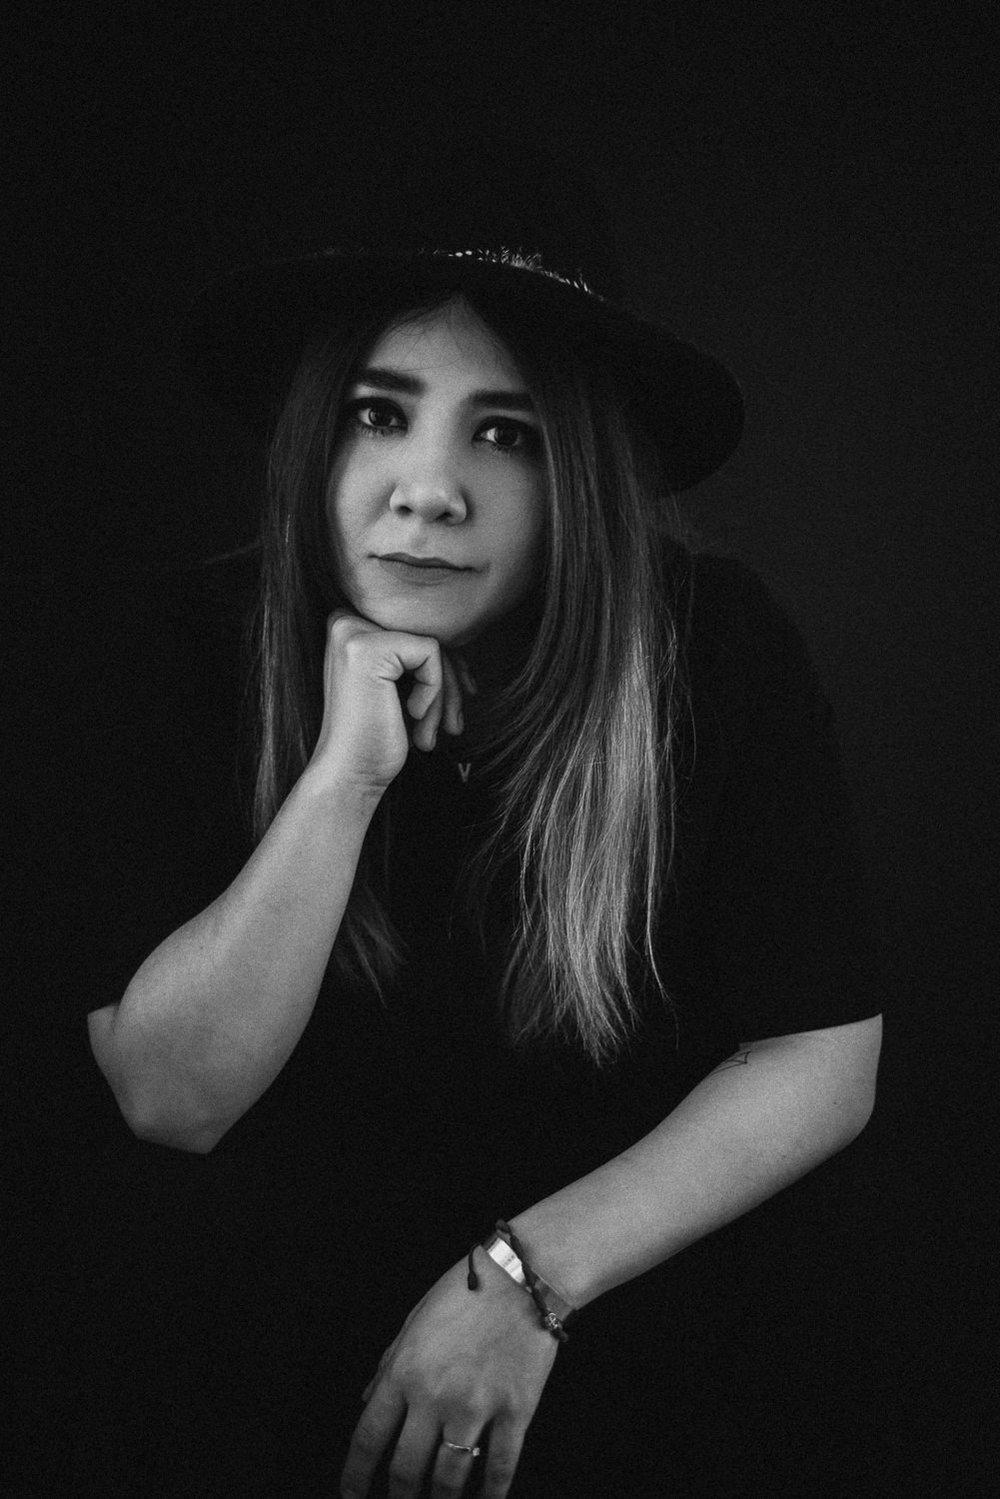 Sesion-de-fotos-mexicali-retrato-arrobamadre-arrobafm-Isa